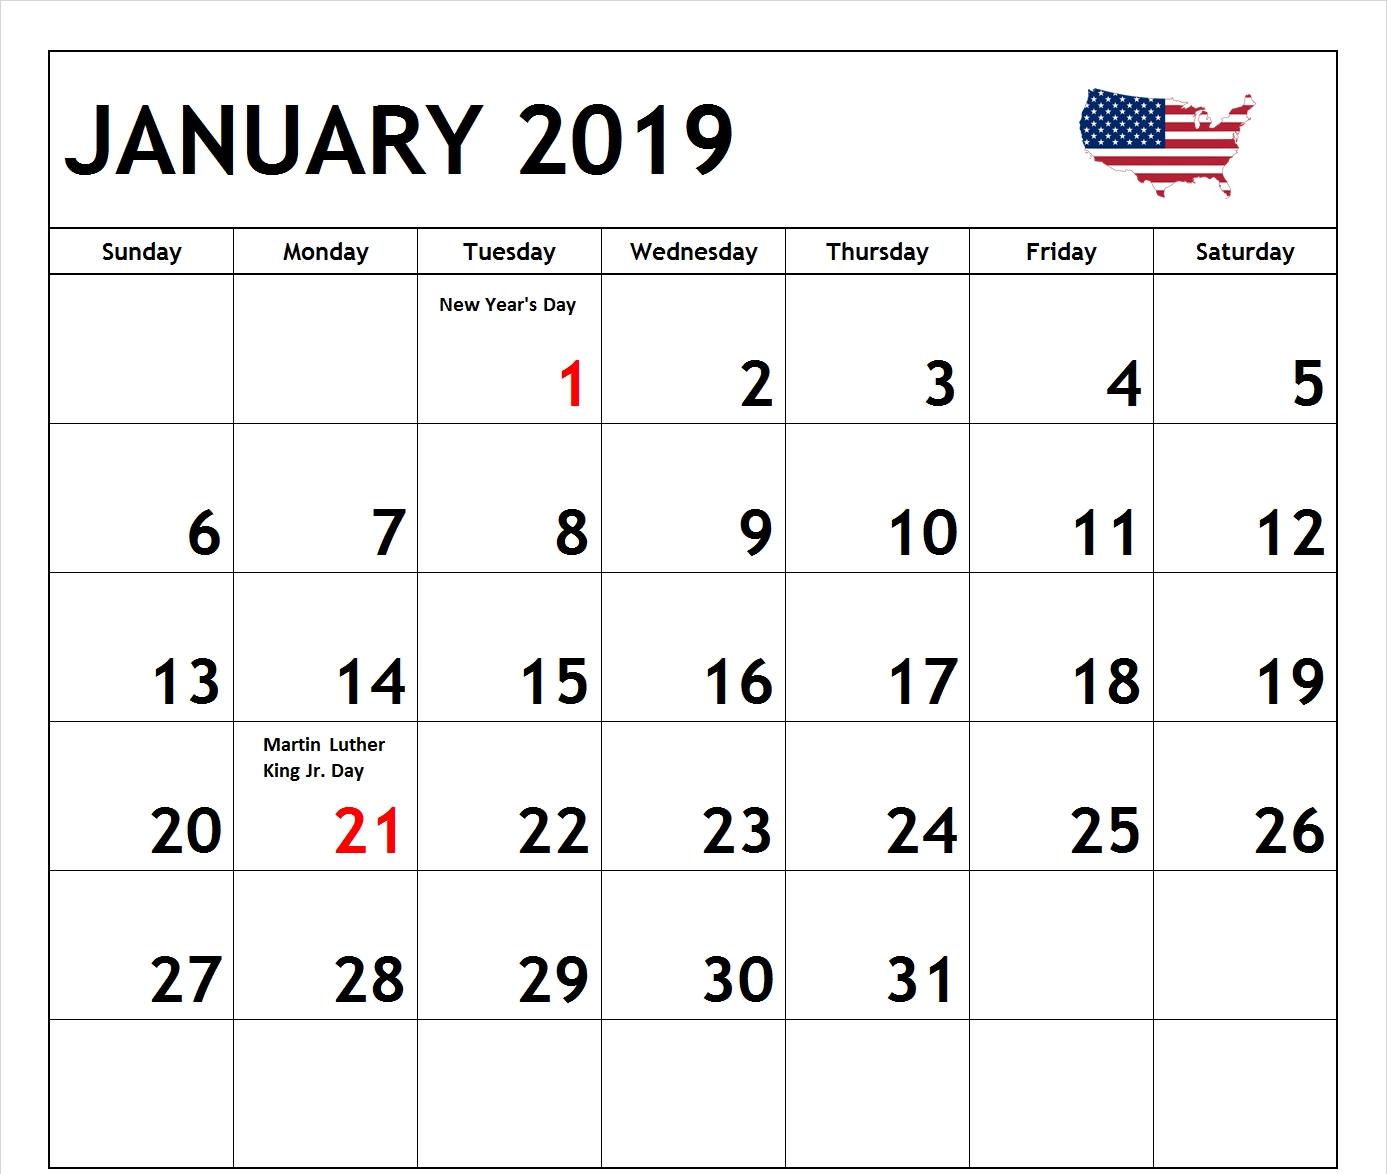 Calendar January 2019 Usa – Free Calendar Templates & Worksheets For Calendar 2019 Usa